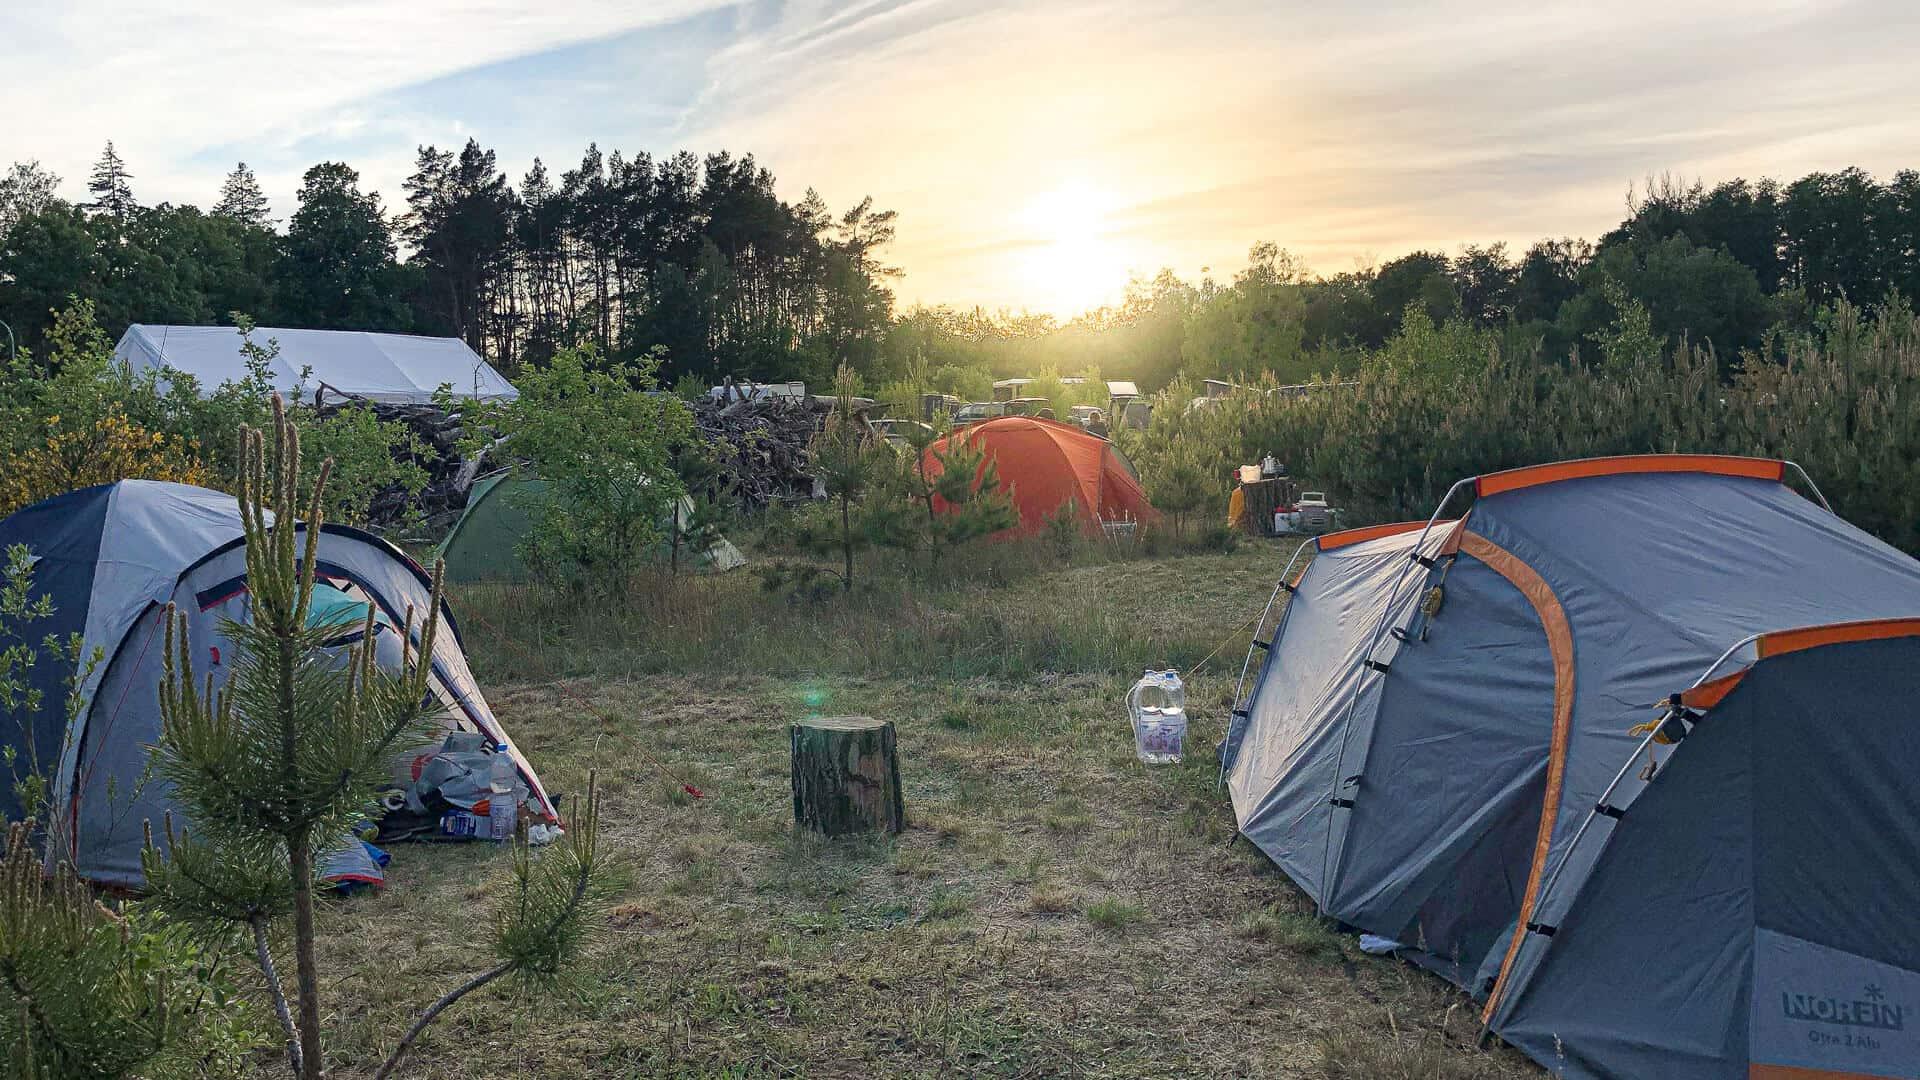 Wilde-Heimat - Naturcamping in Brandenburg